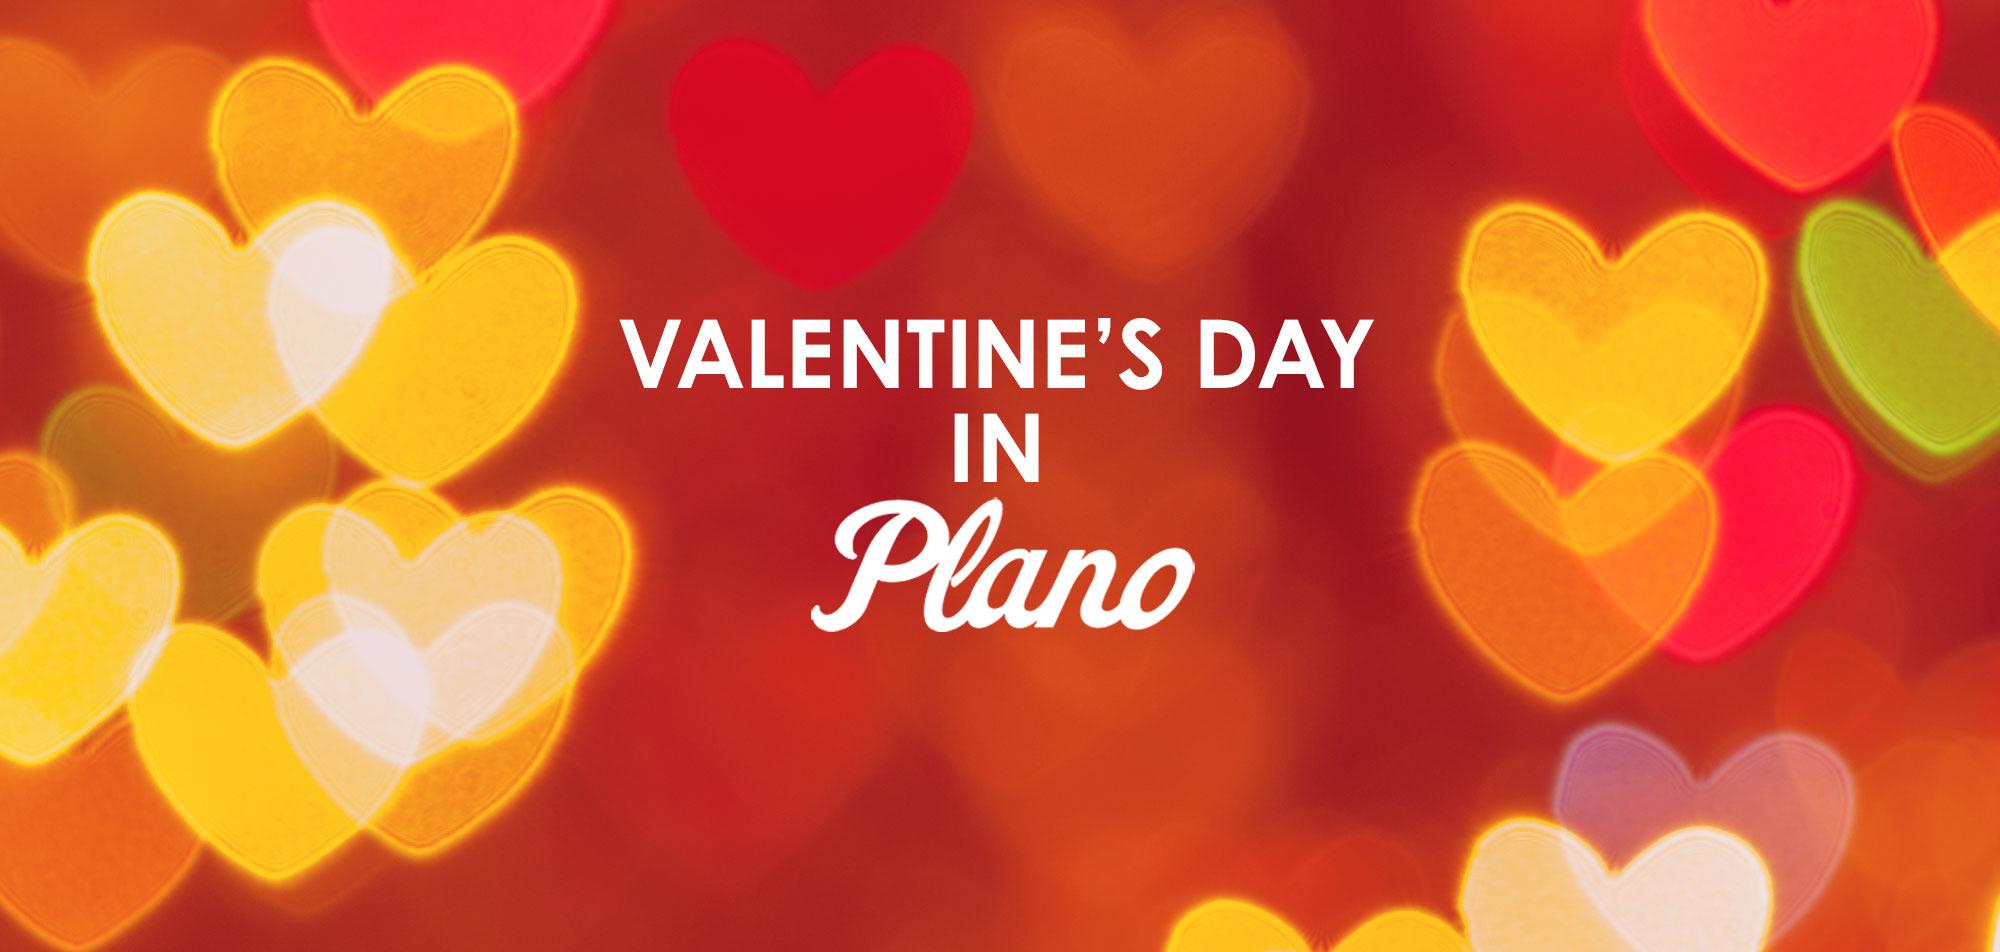 Top Picks For Valentines Day Dates In Plano Plano Magazine